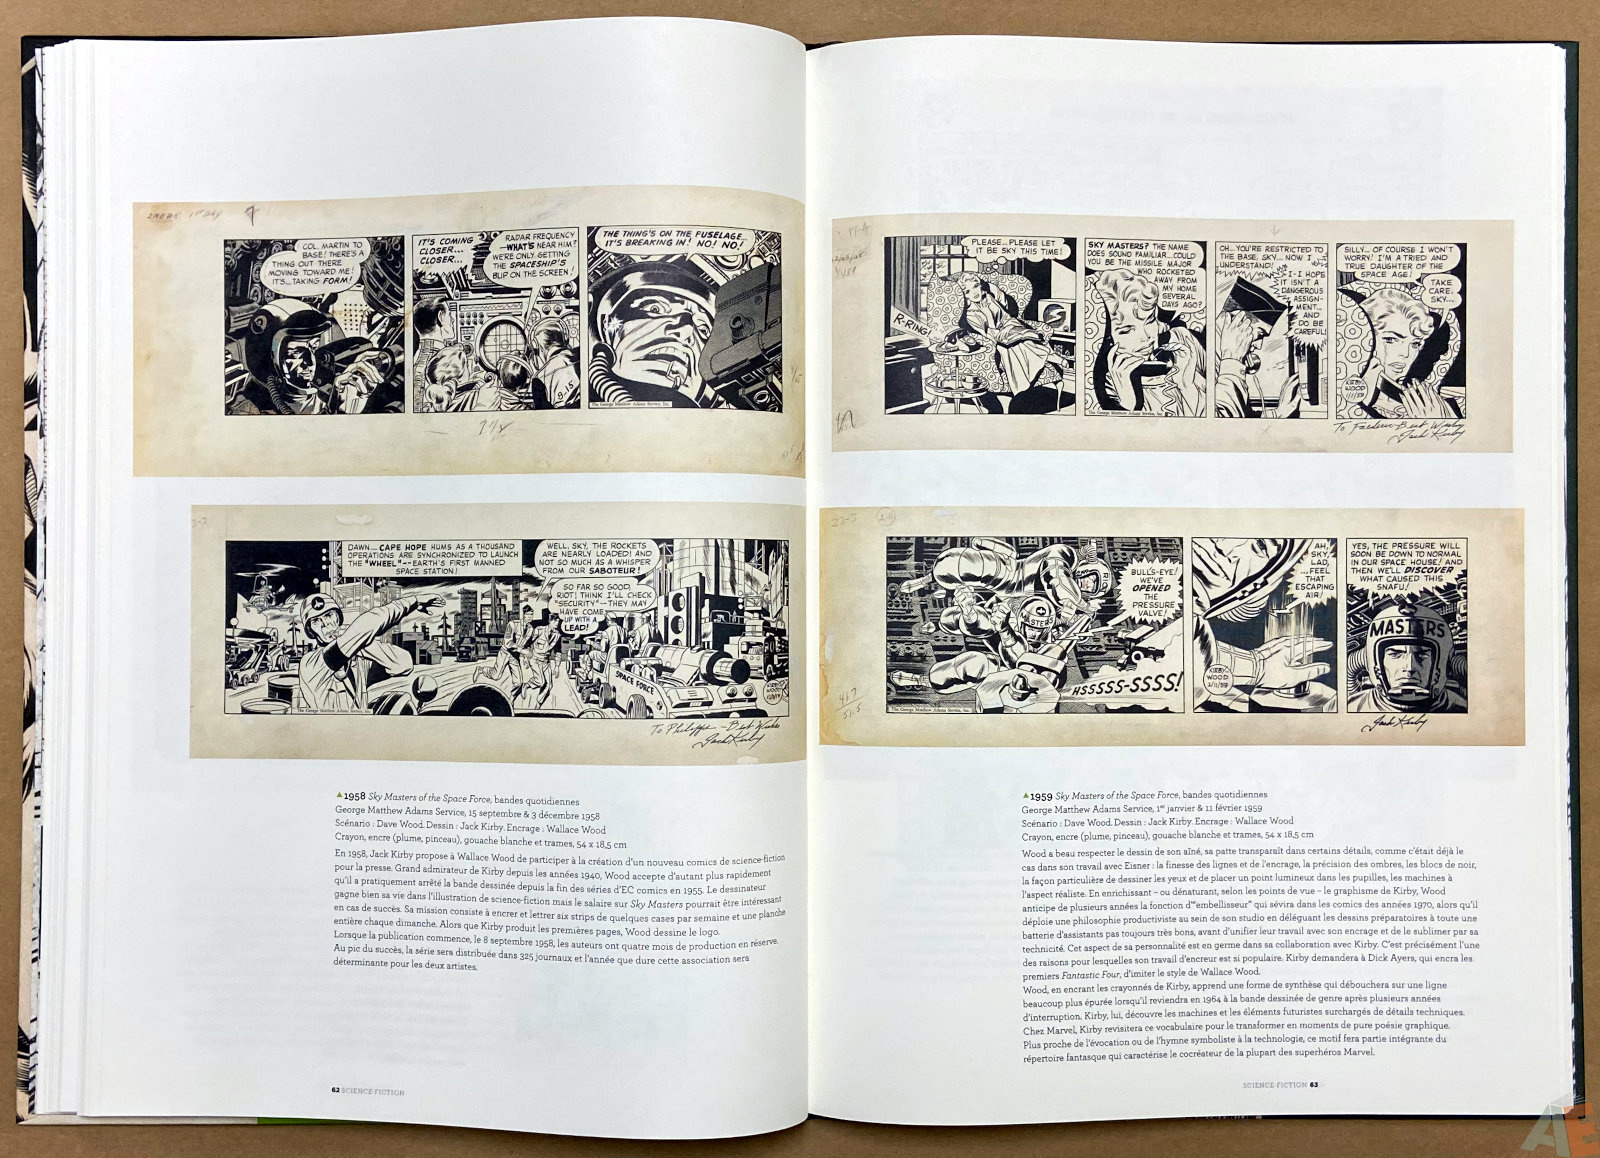 Les Mondes De Wallace Wood catalogue interior 6